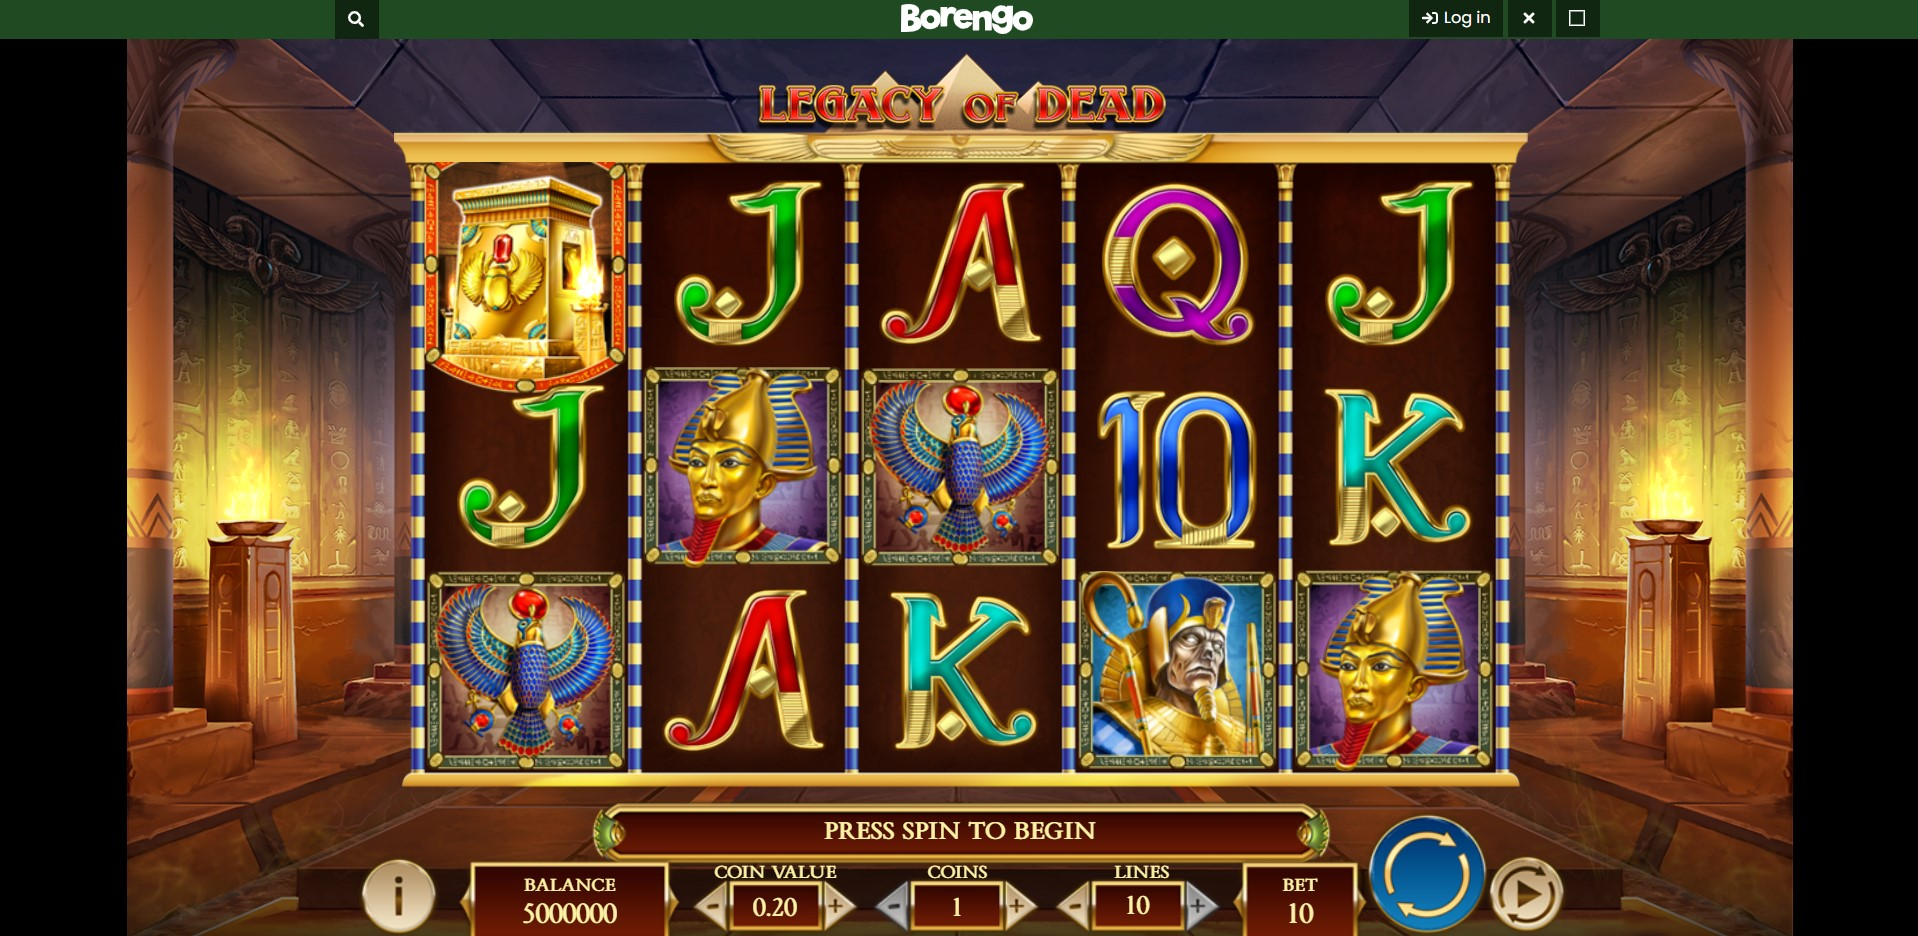 Game Play at Borengo Casino